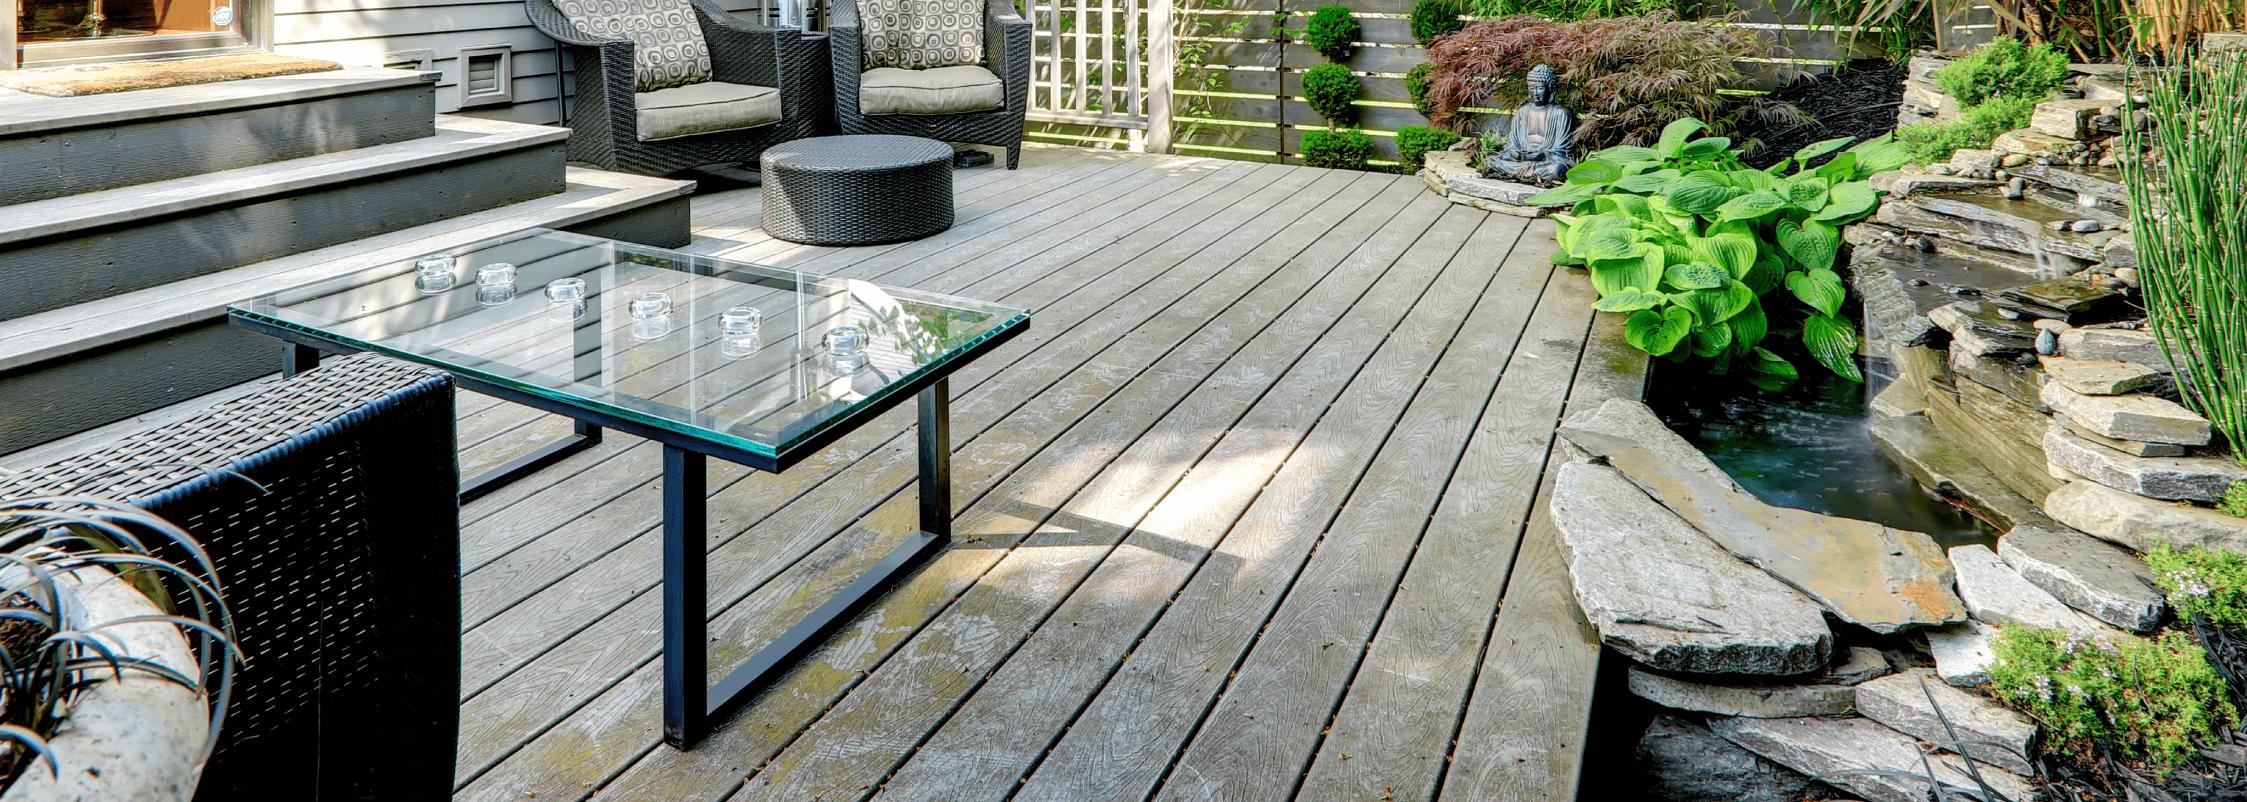 Custom-made glass patio table top